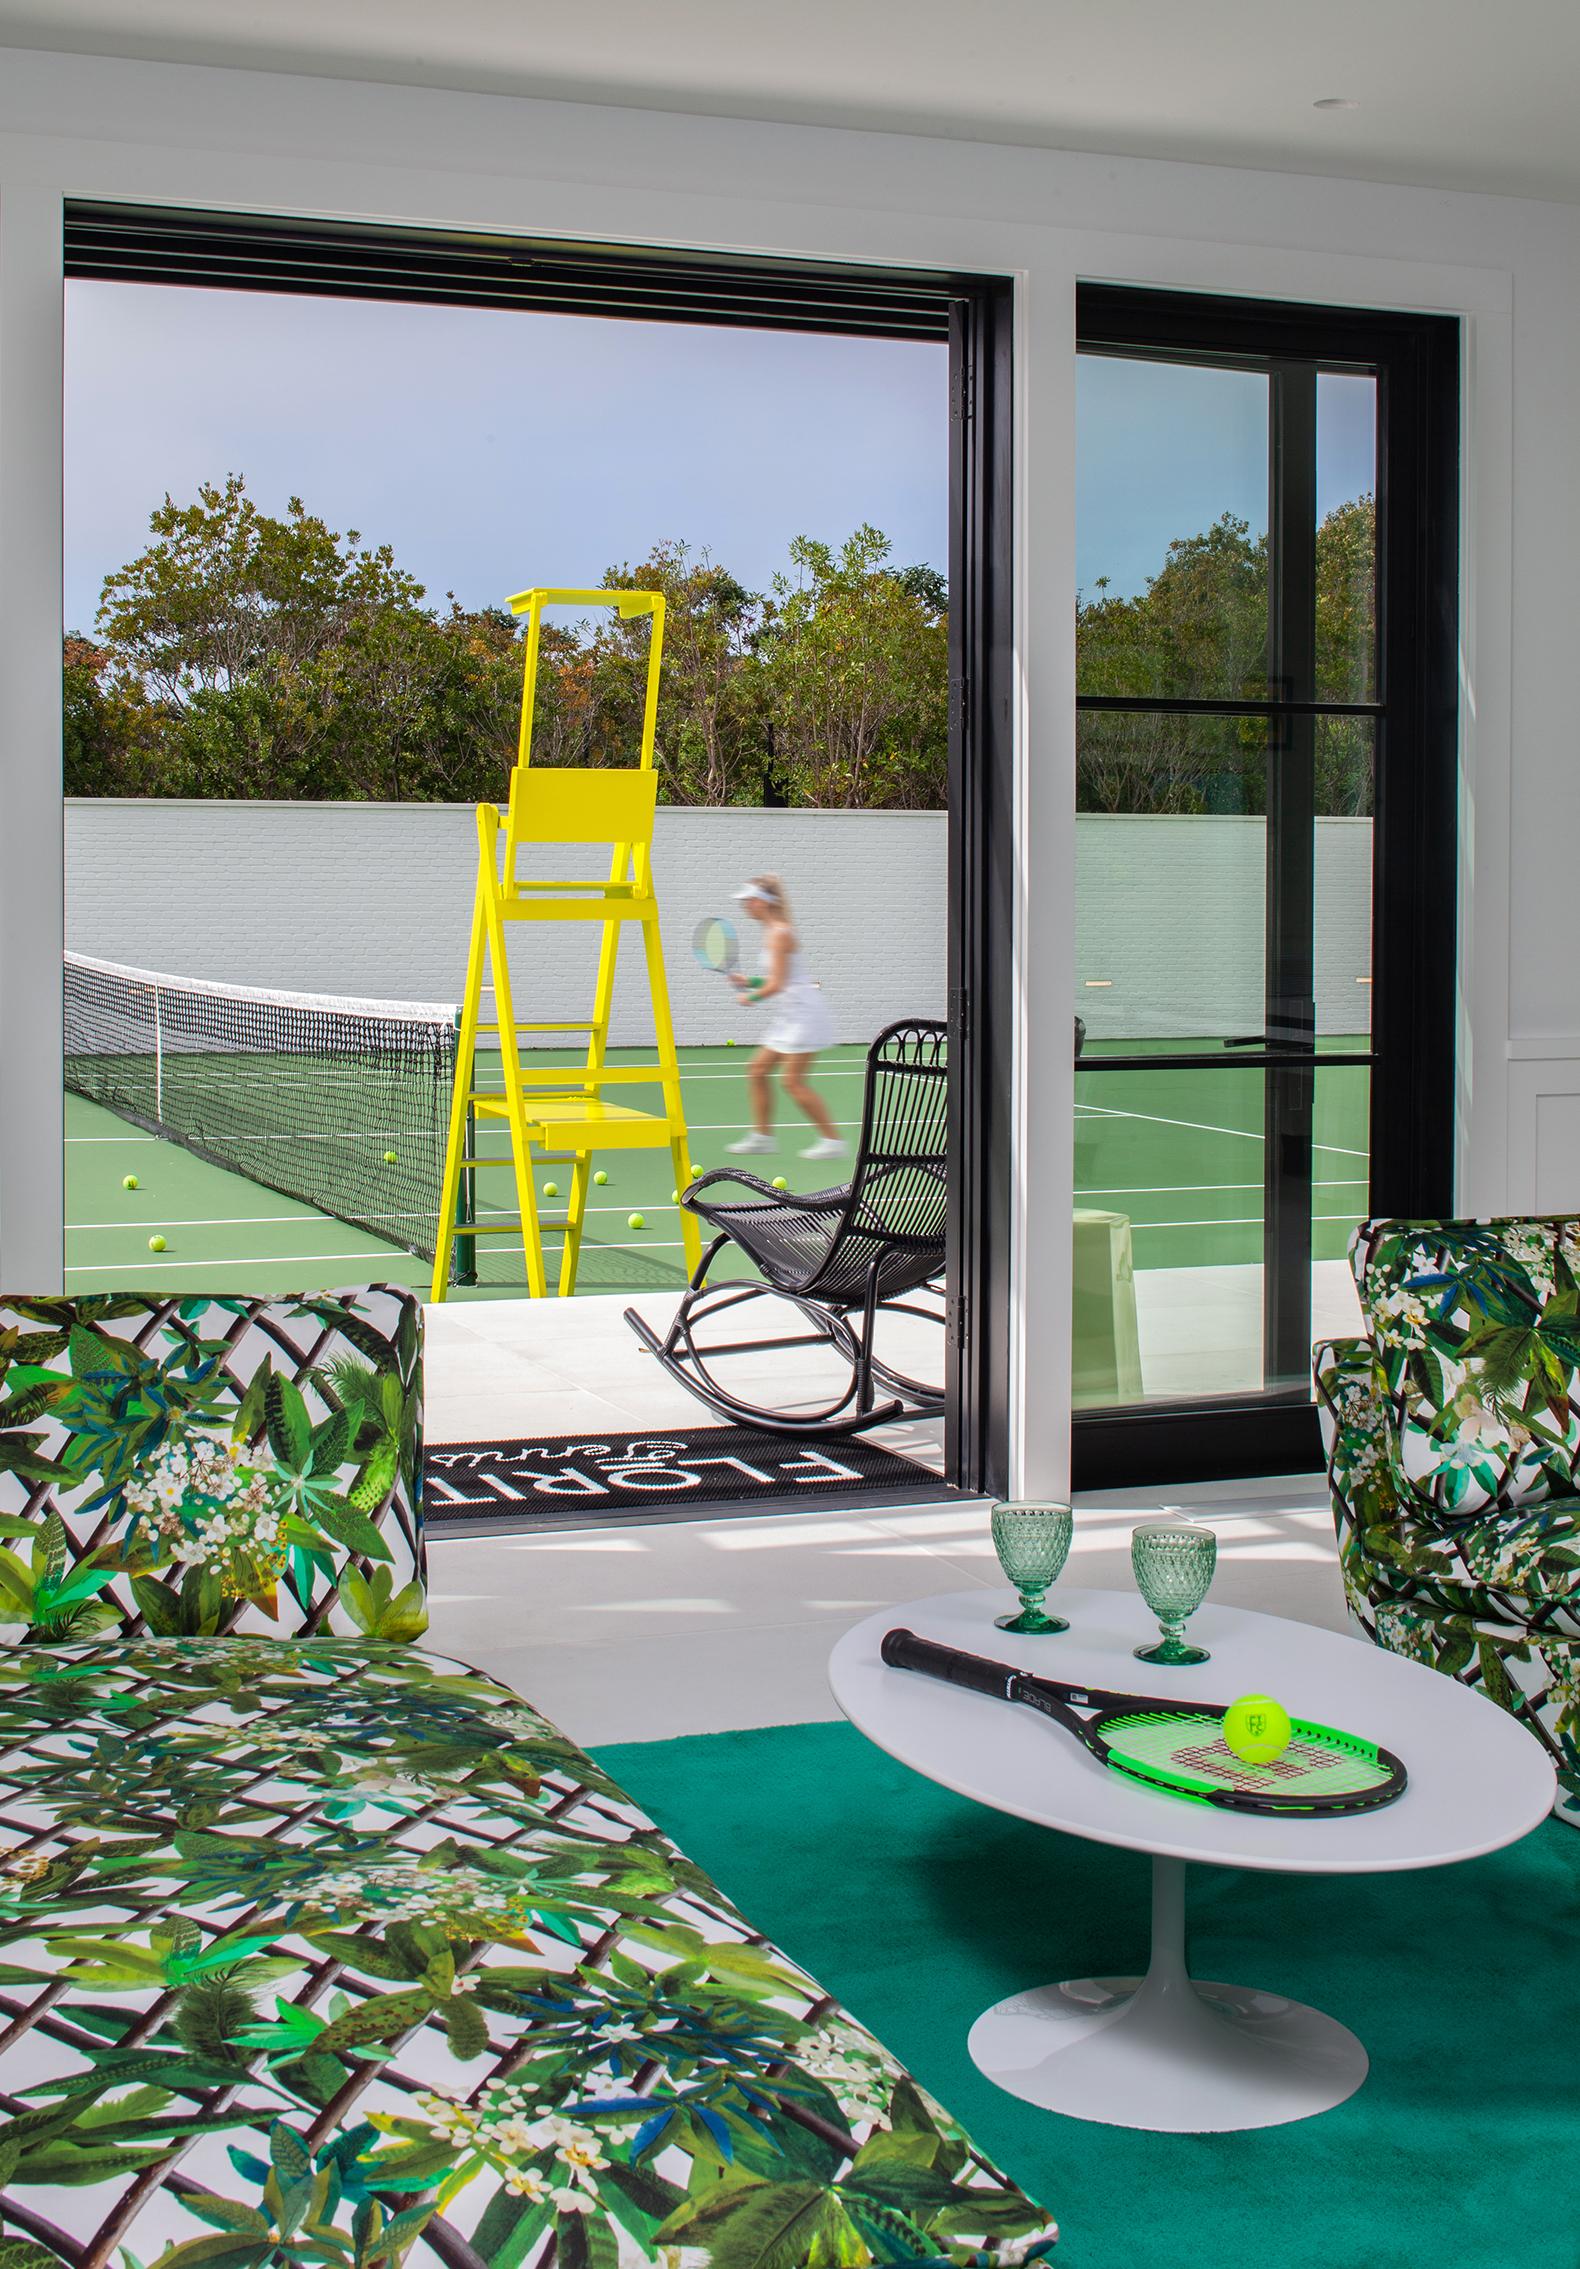 ©+ghislaine+vinas+interior+design_tennis-pavillion_5_3.jpg